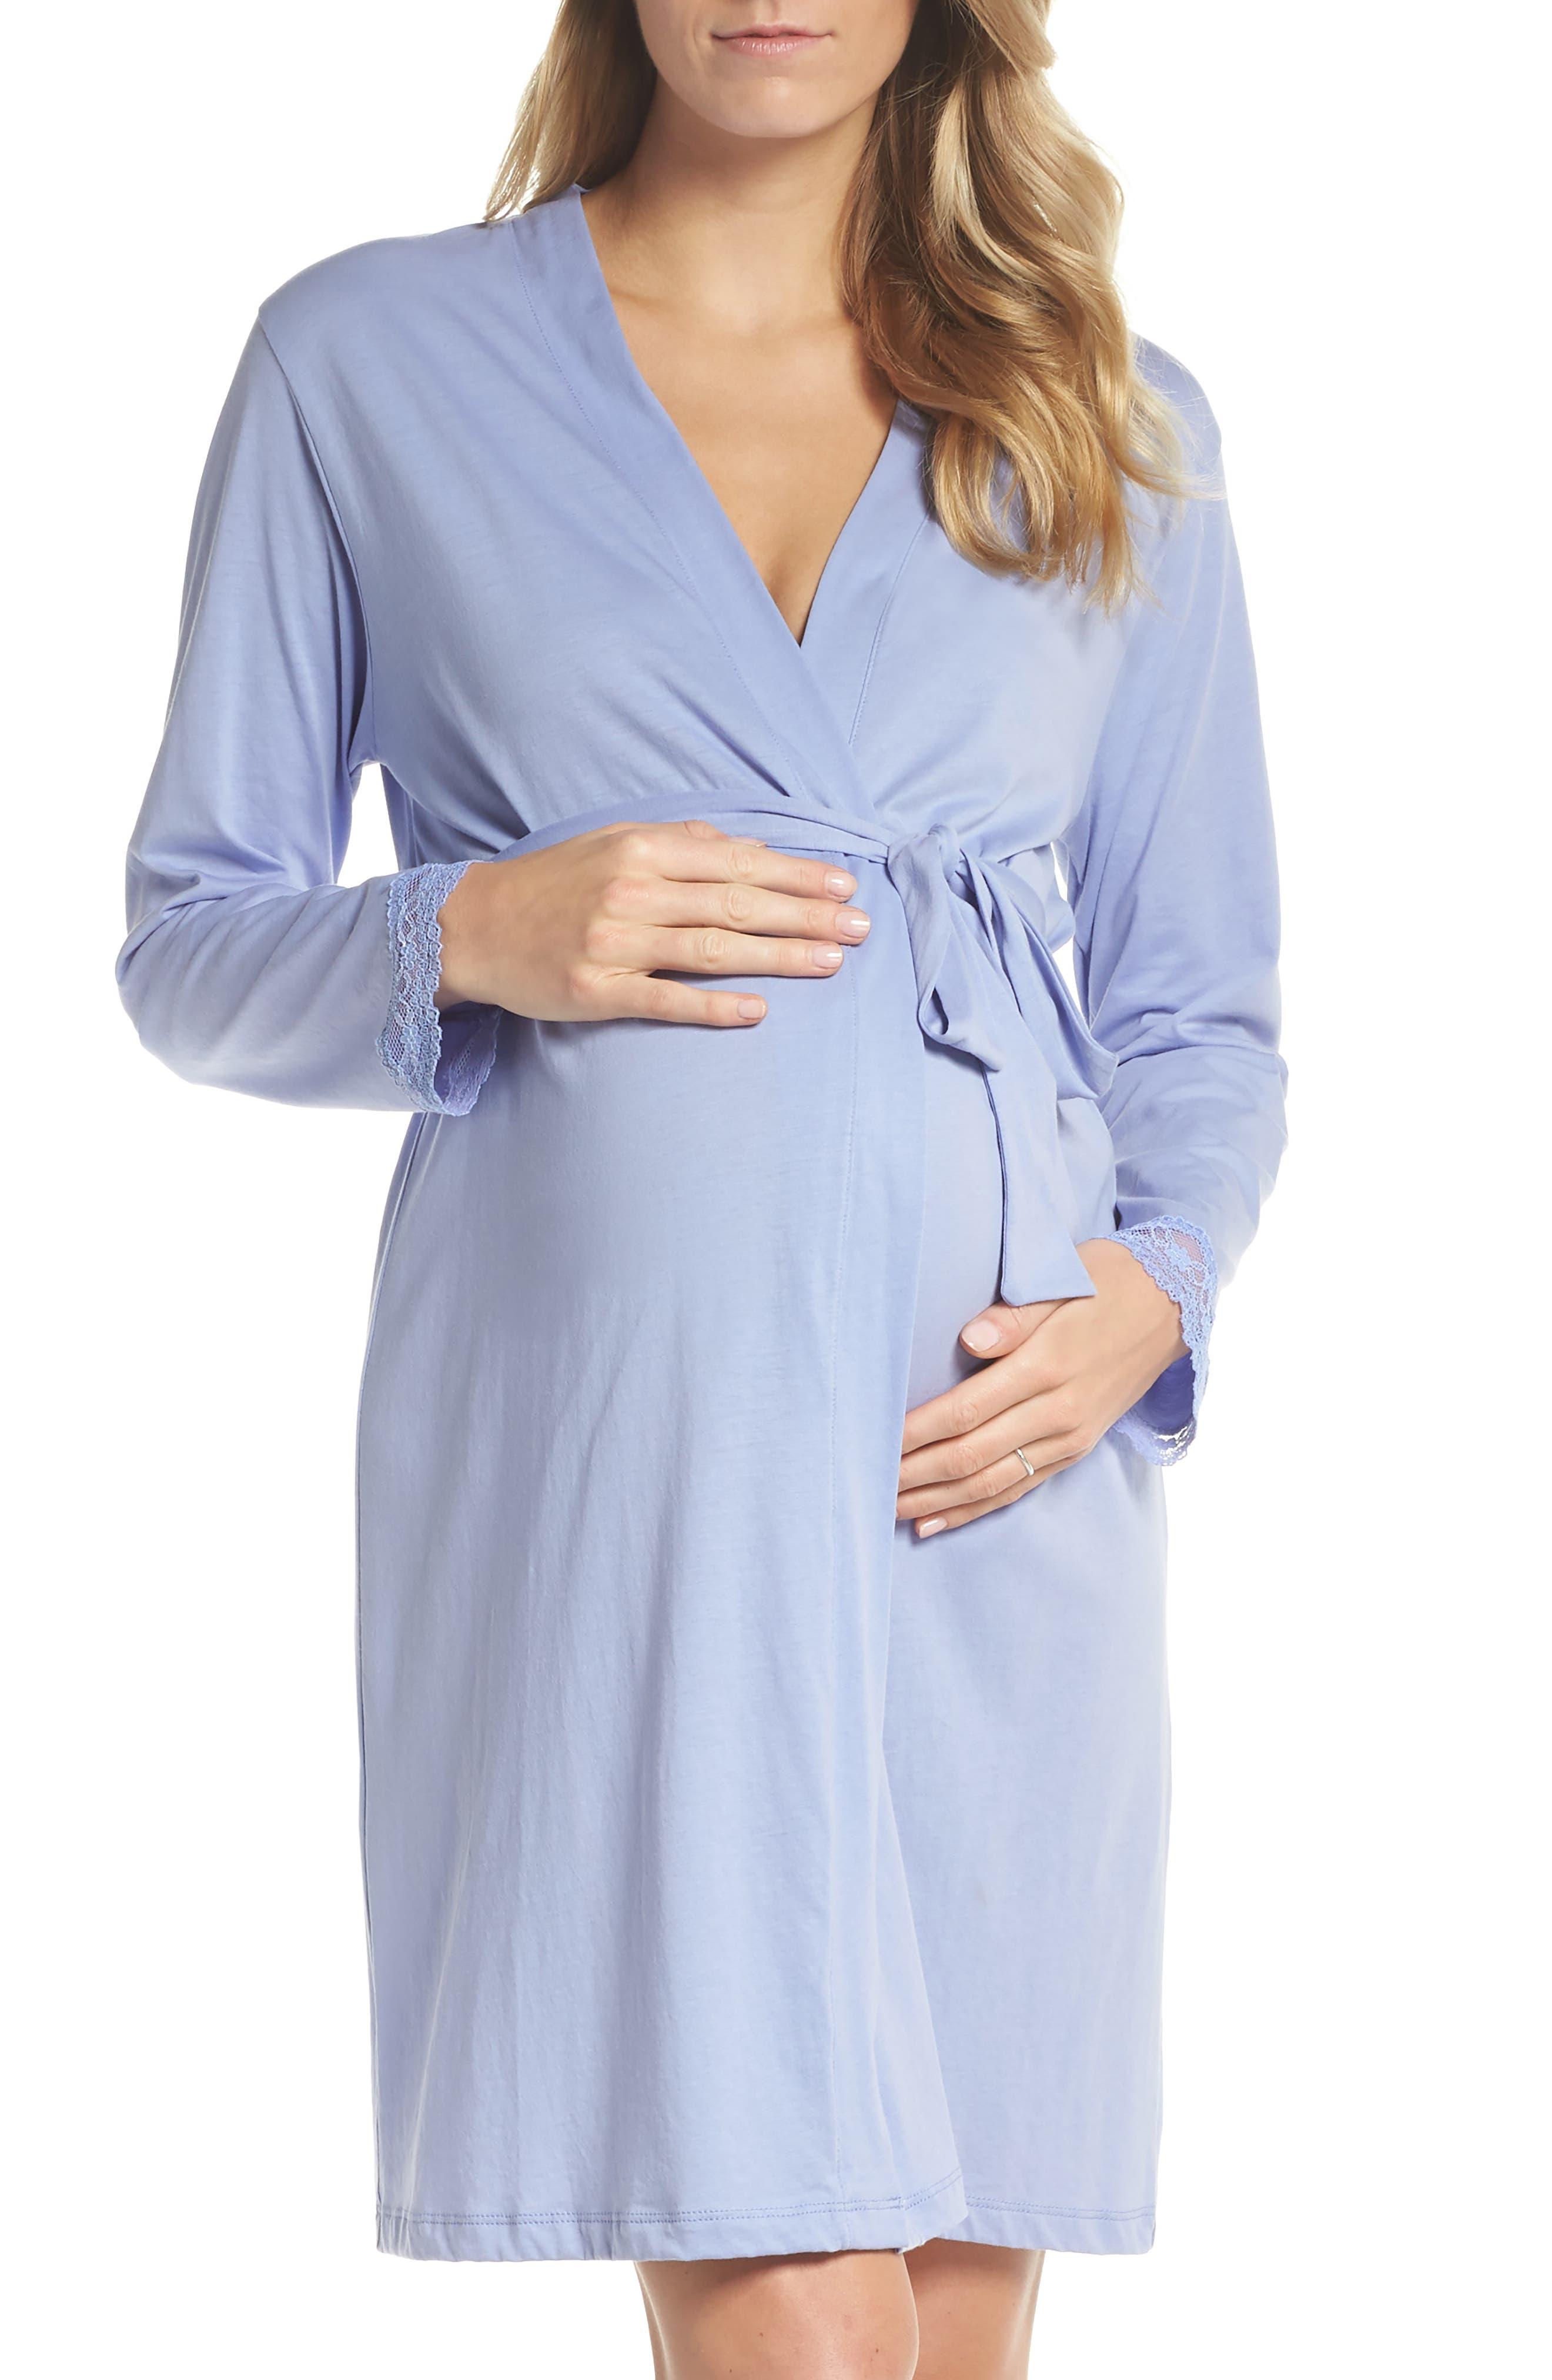 Violette Maternity/Nursing Robe,                         Main,                         color, PURPLE